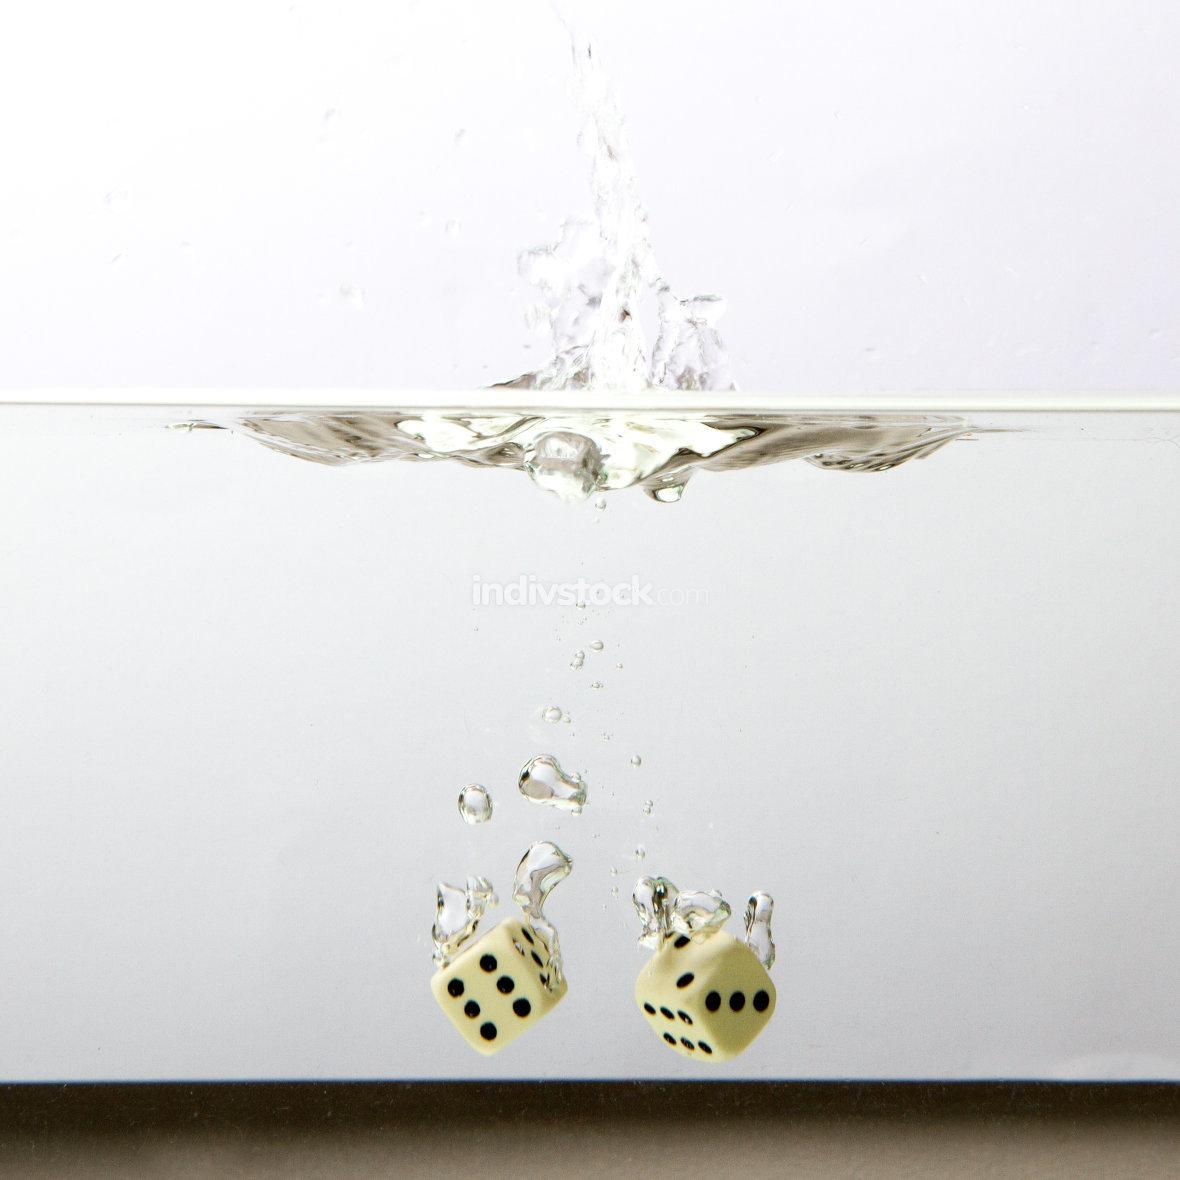 Dice with splashing water